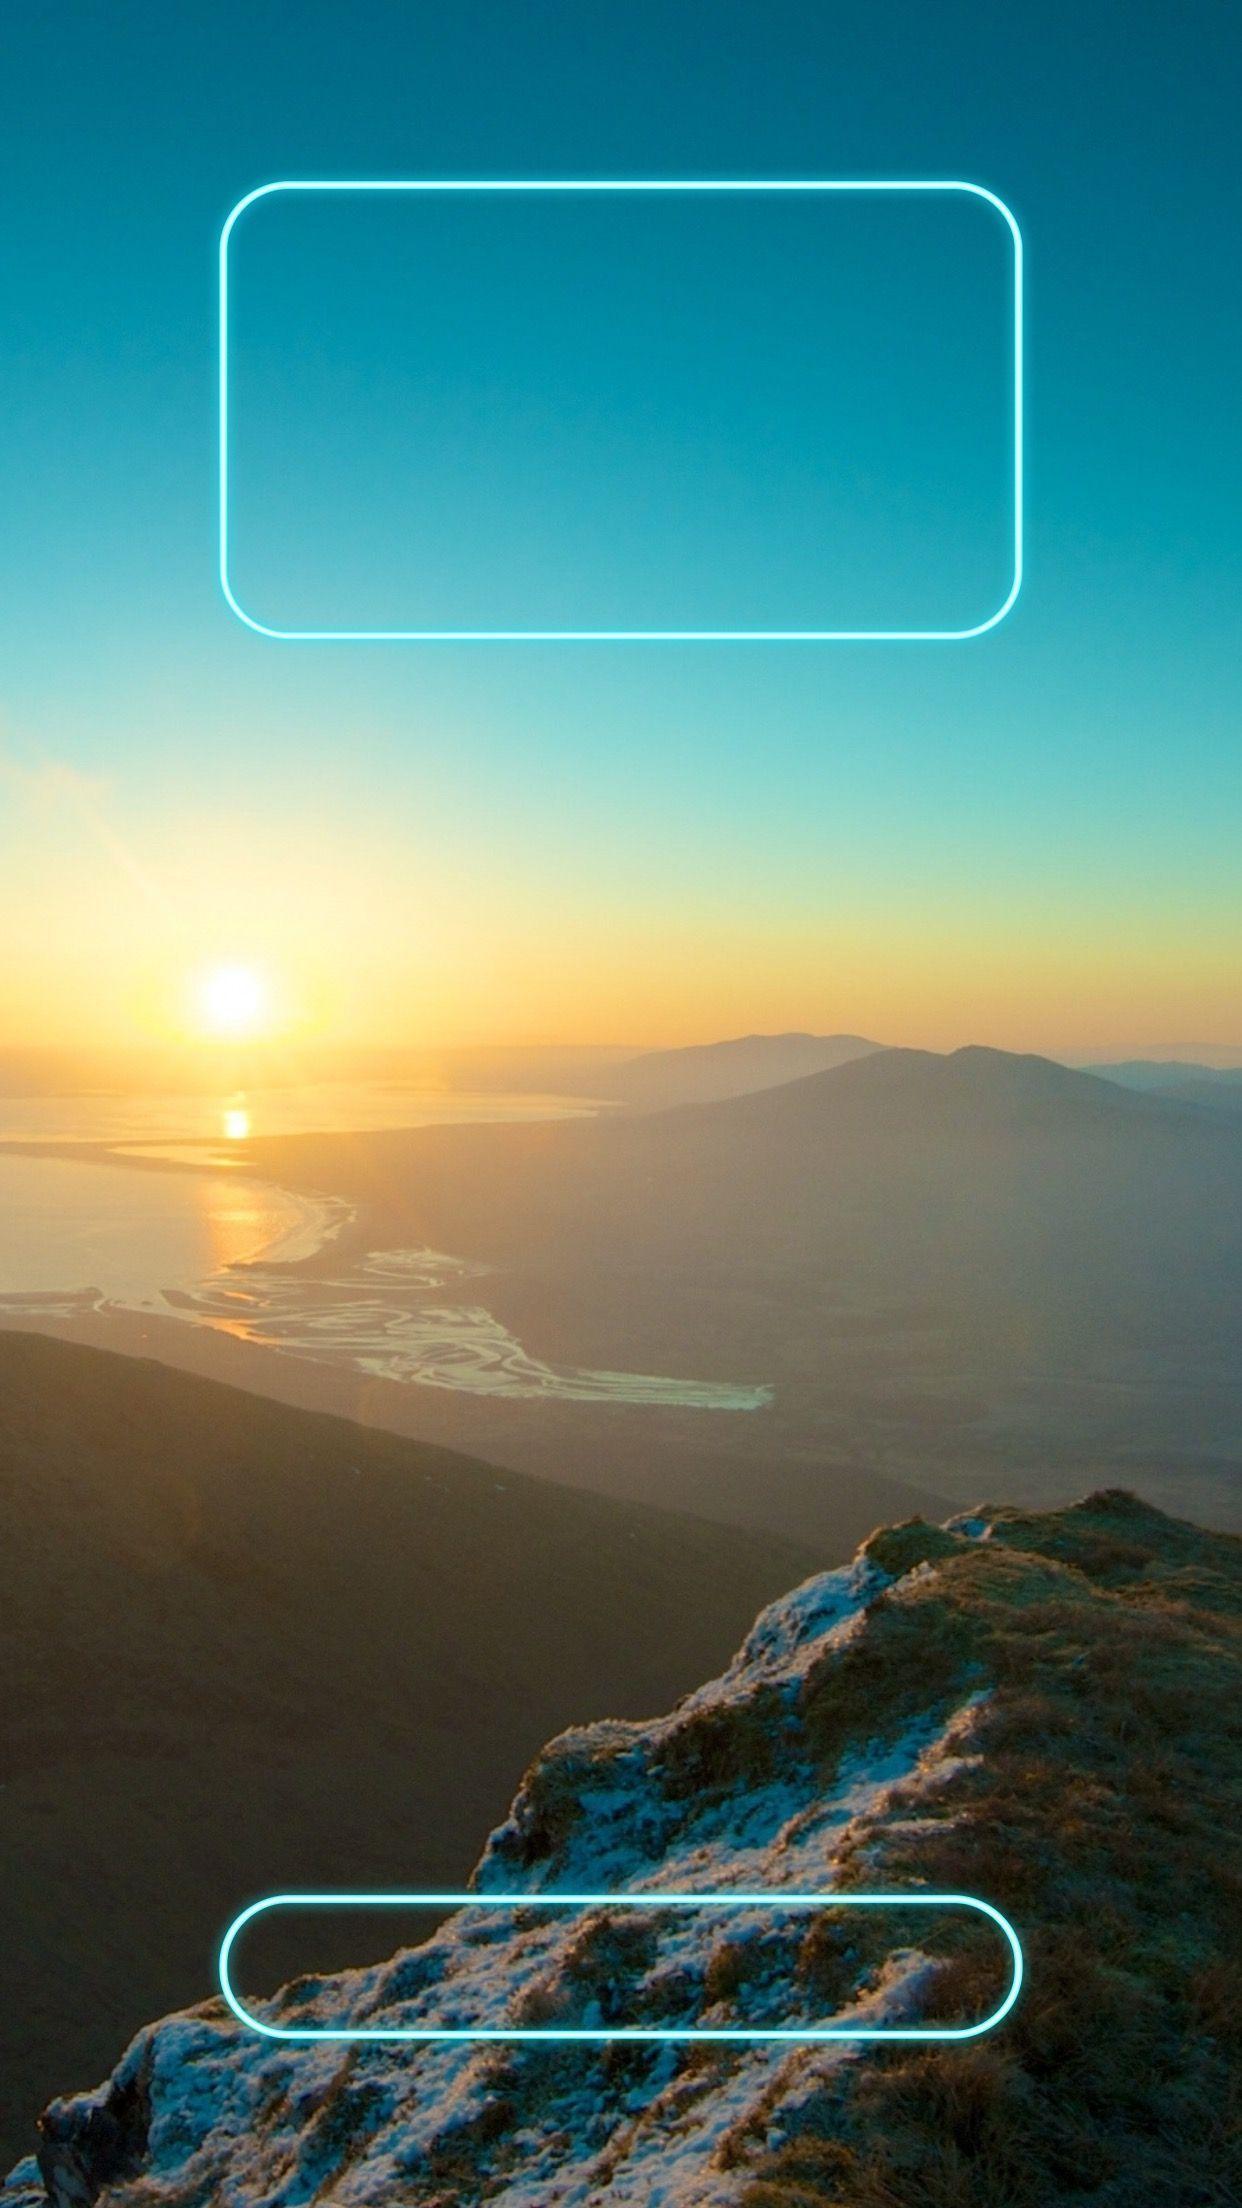 iPhone Lock Screen Wallpapers on WallpaperDog